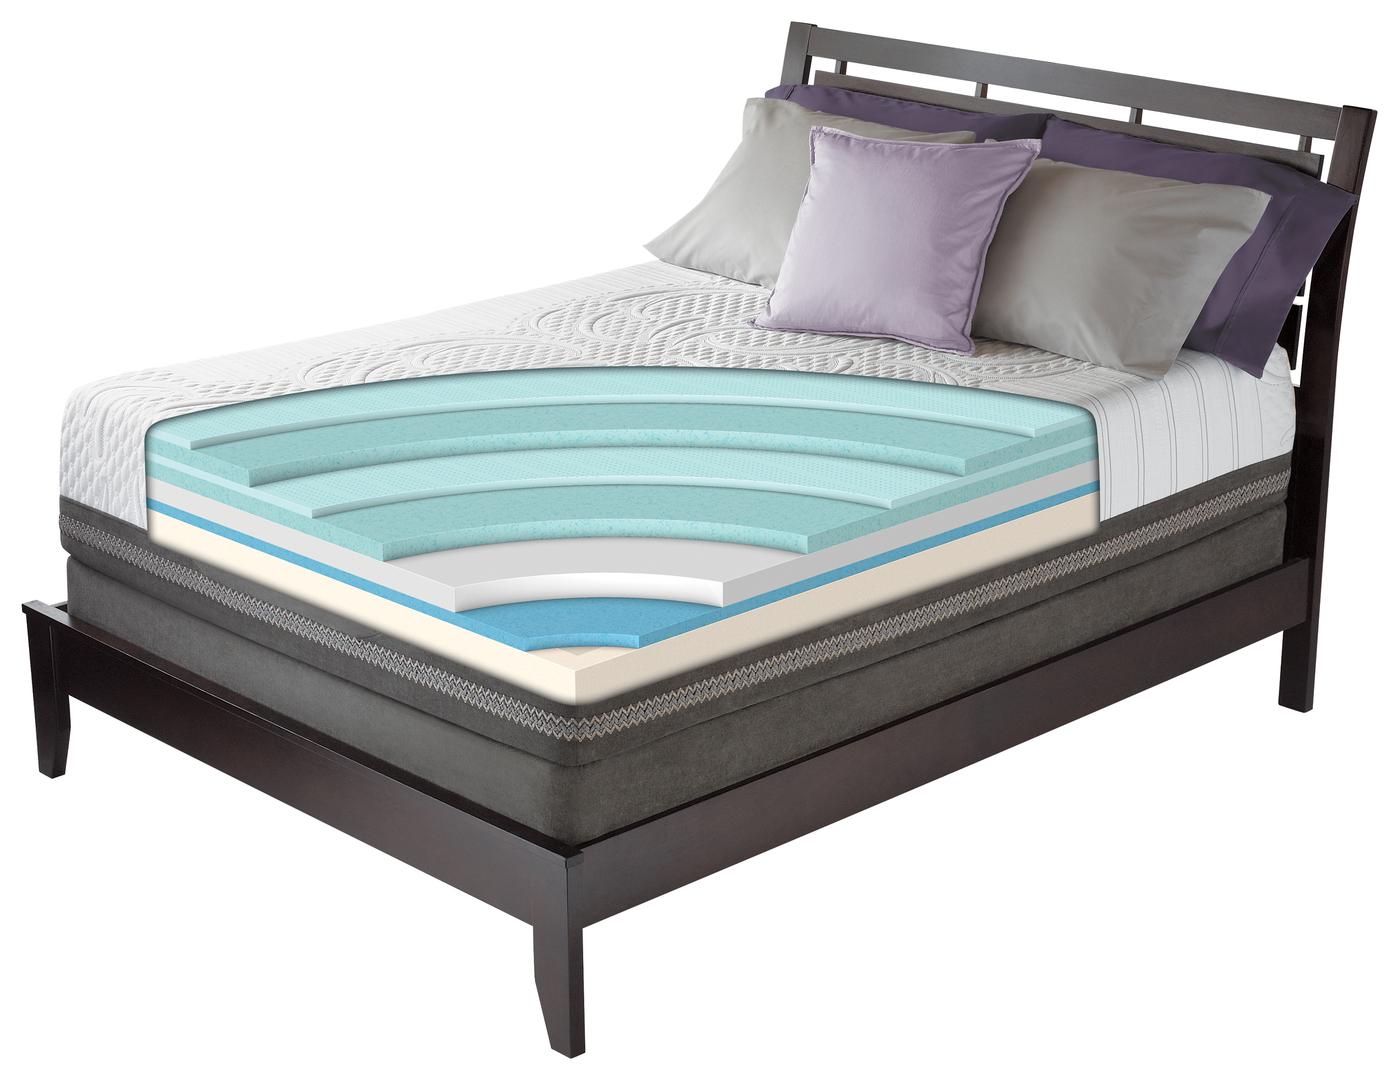 mattress icomfort serta mattresses beds bed lakewood